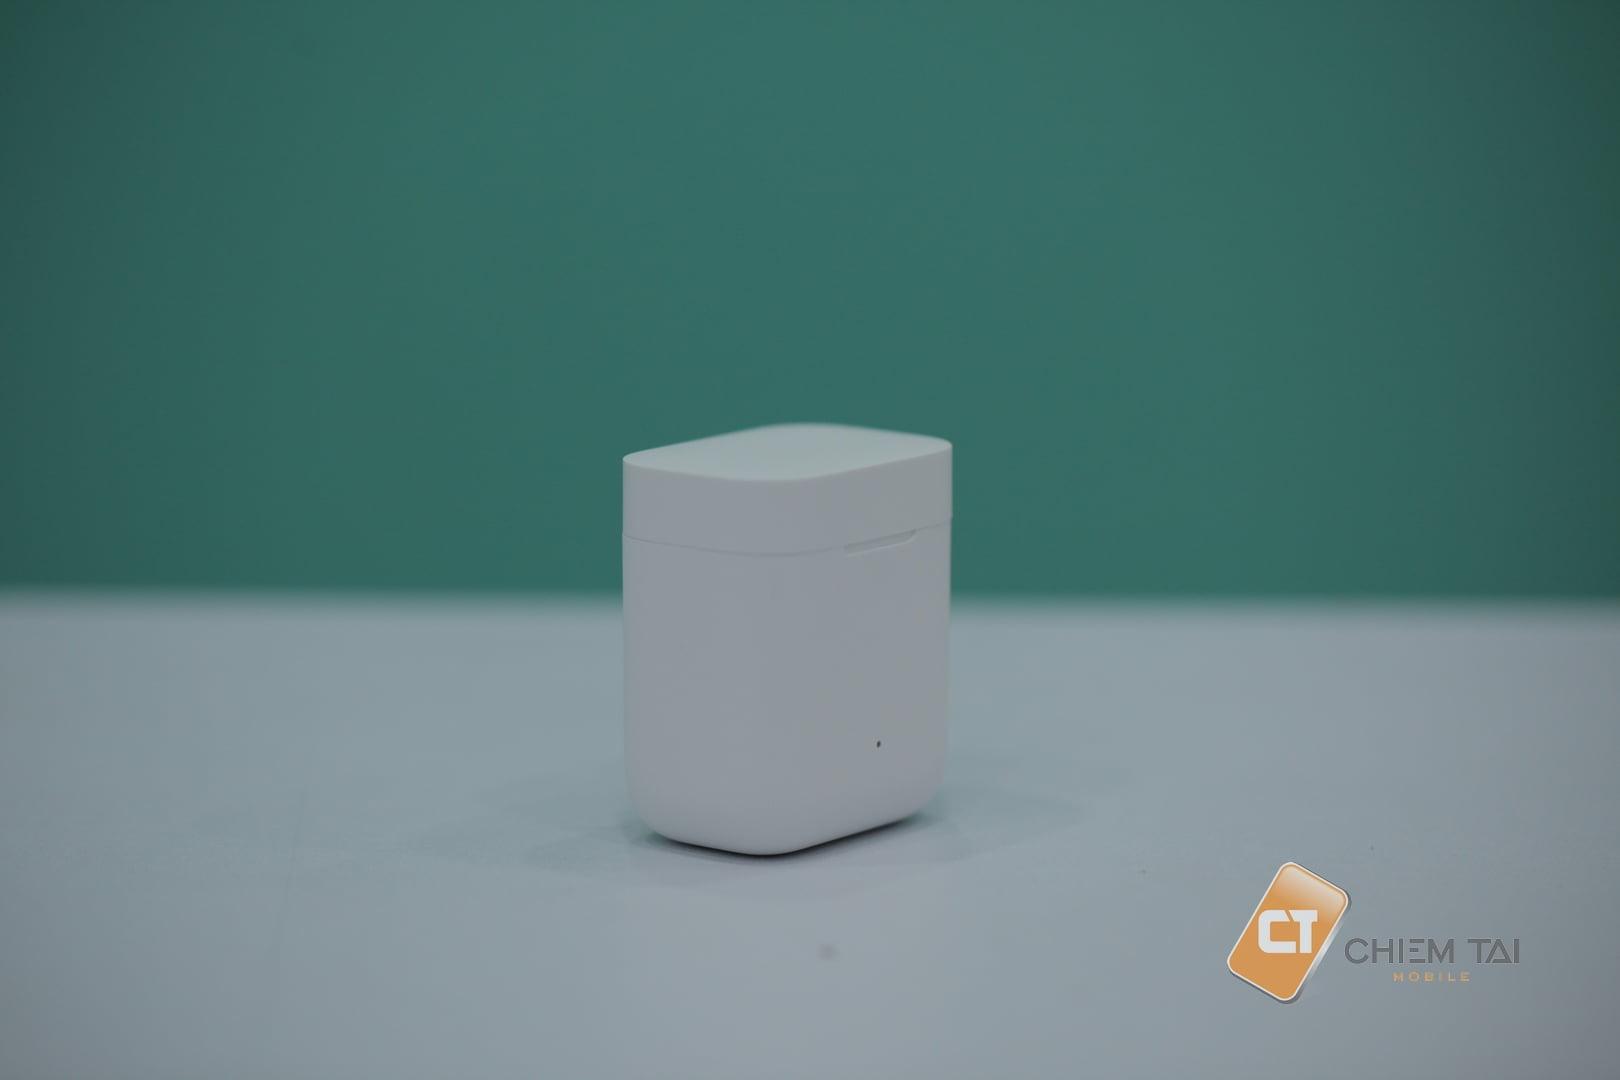 tai nghe airdots pro true wireless xiaomi air 605065e996f46